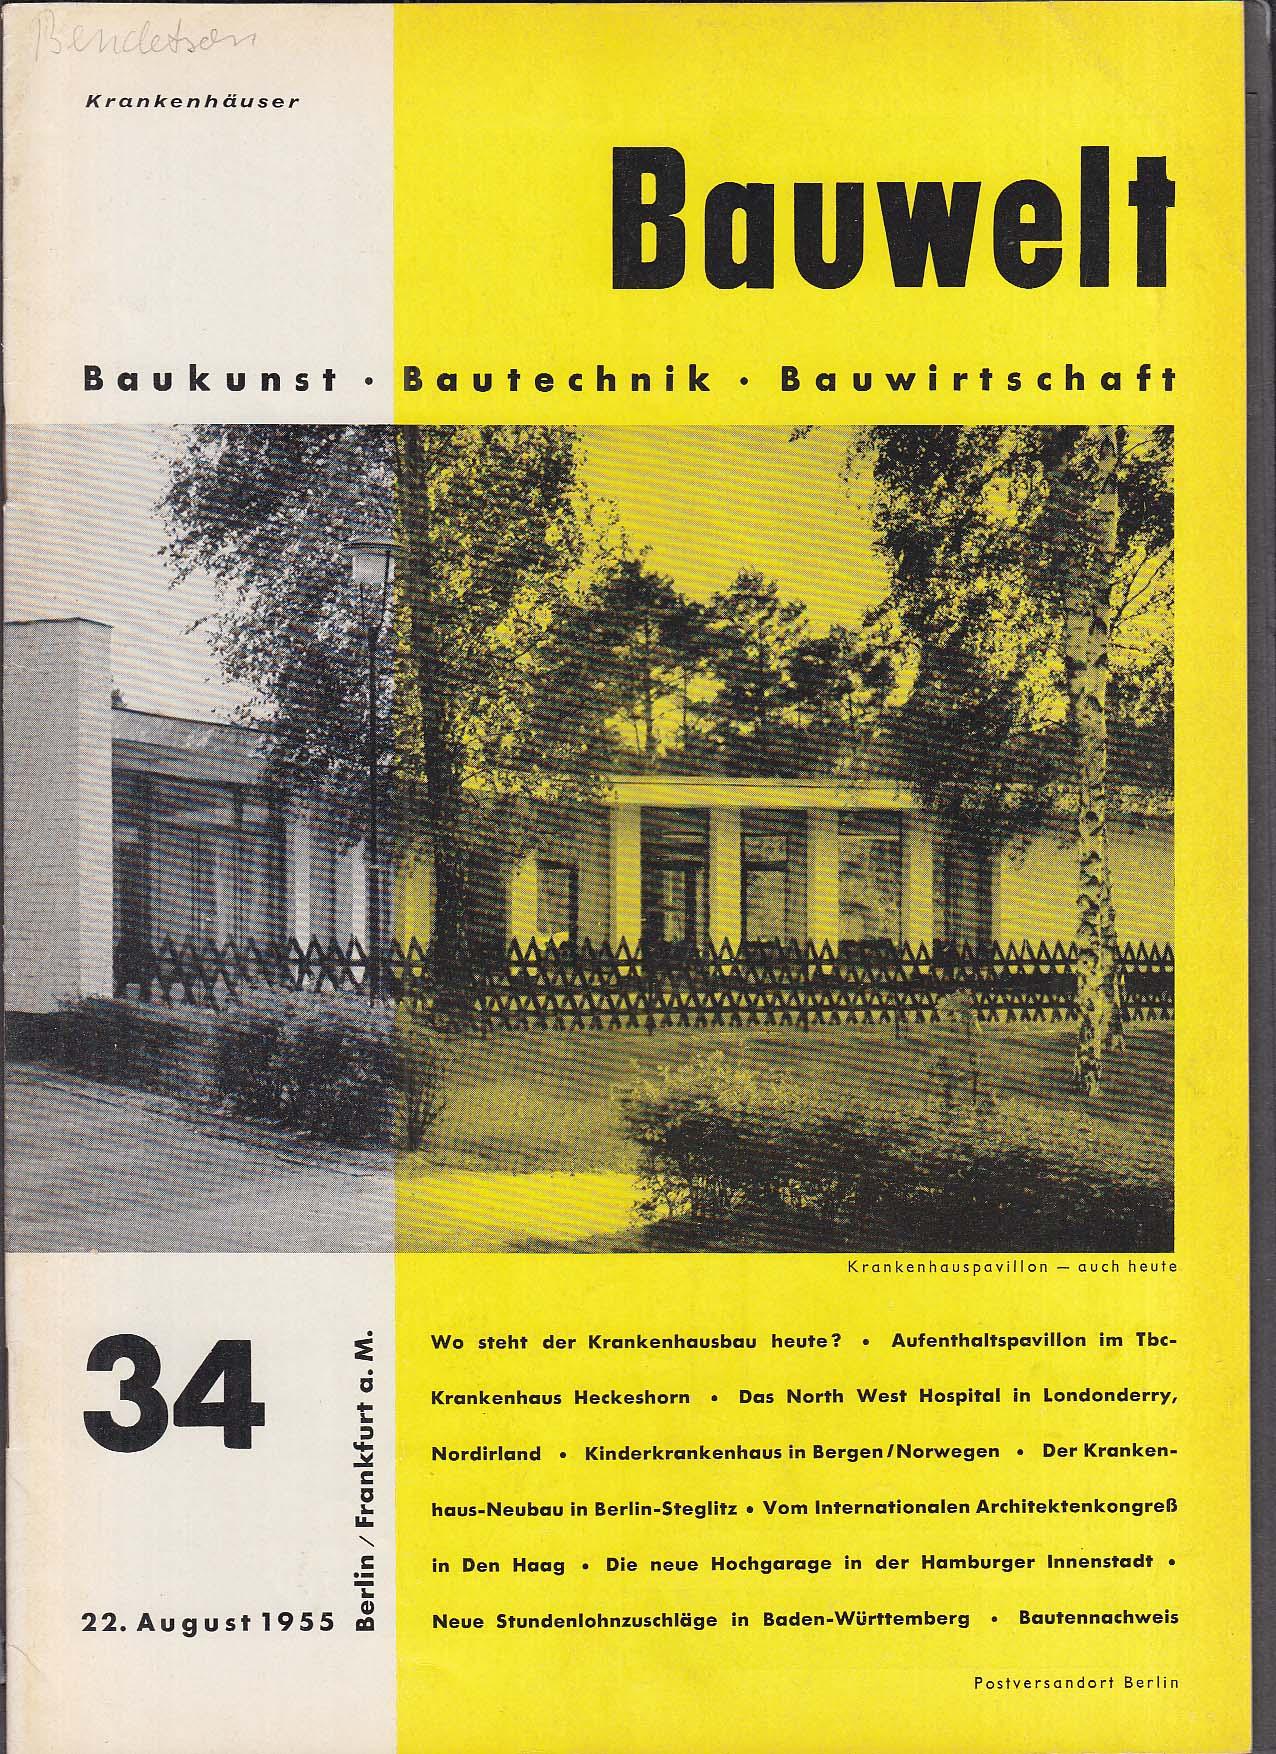 Bauwelt German architecture magazine 8/22/1955 34